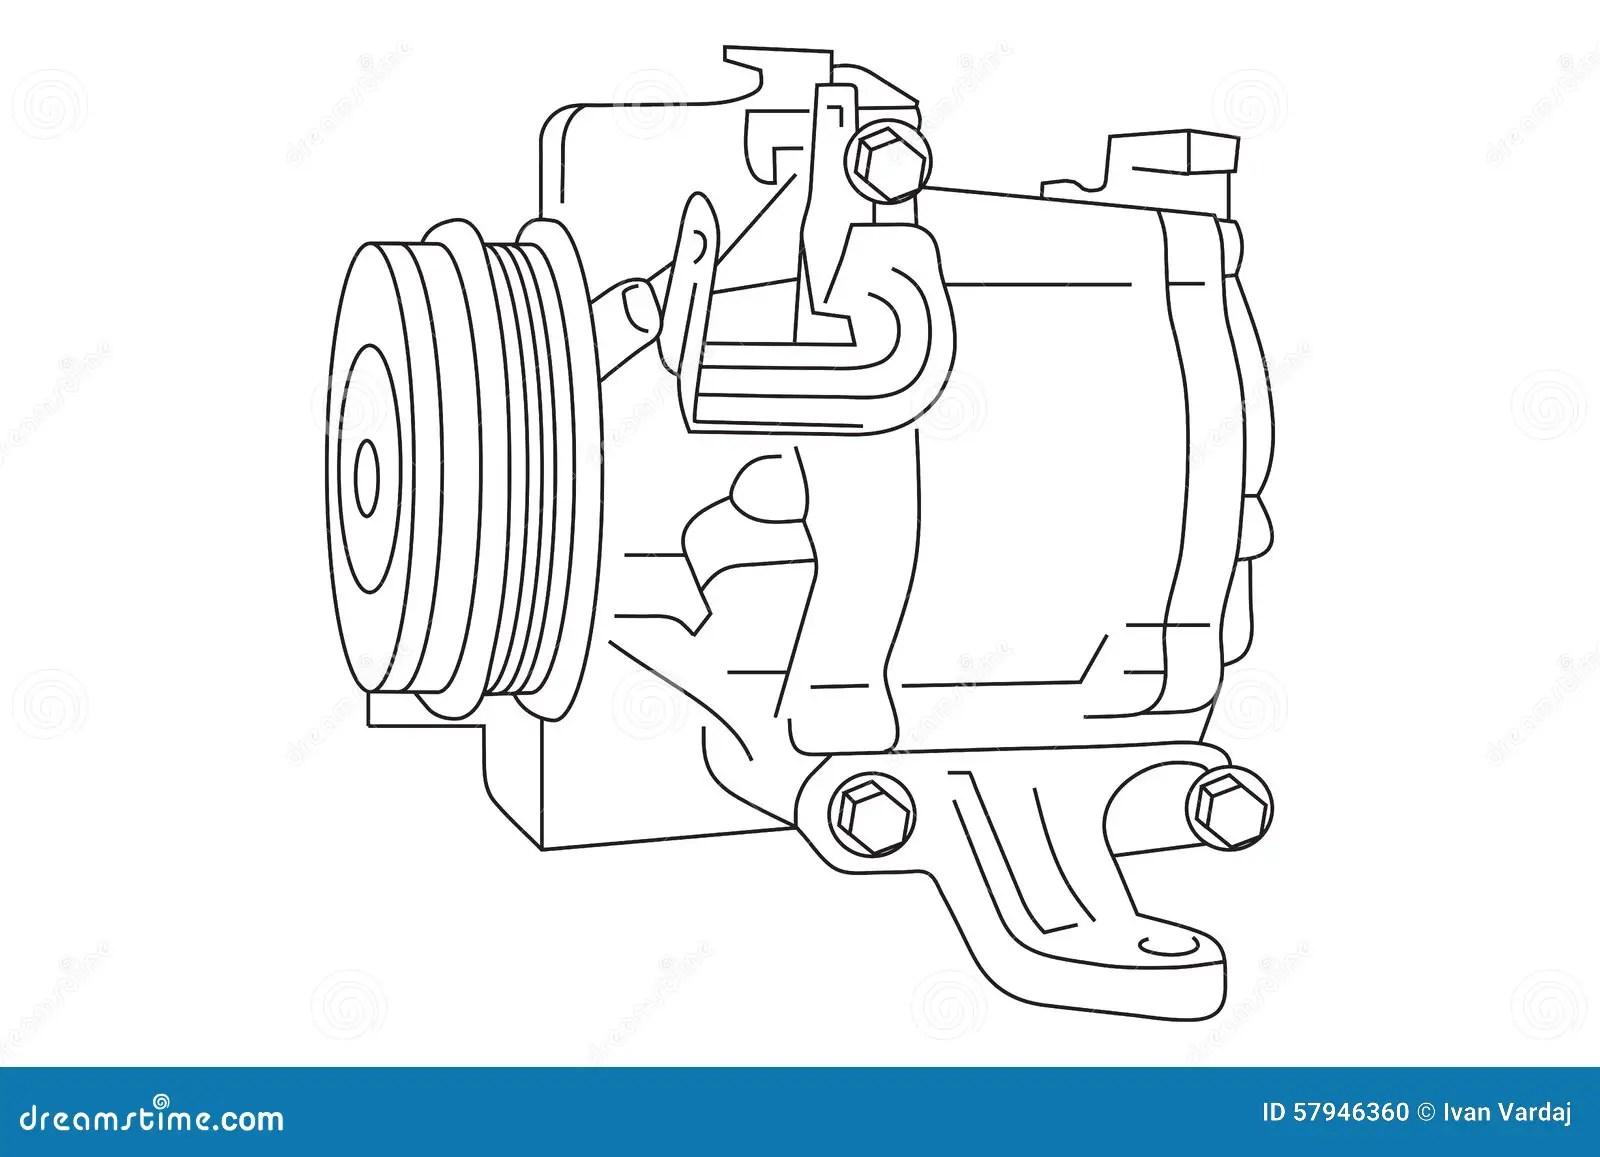 hight resolution of auto air conditioner compressor draft